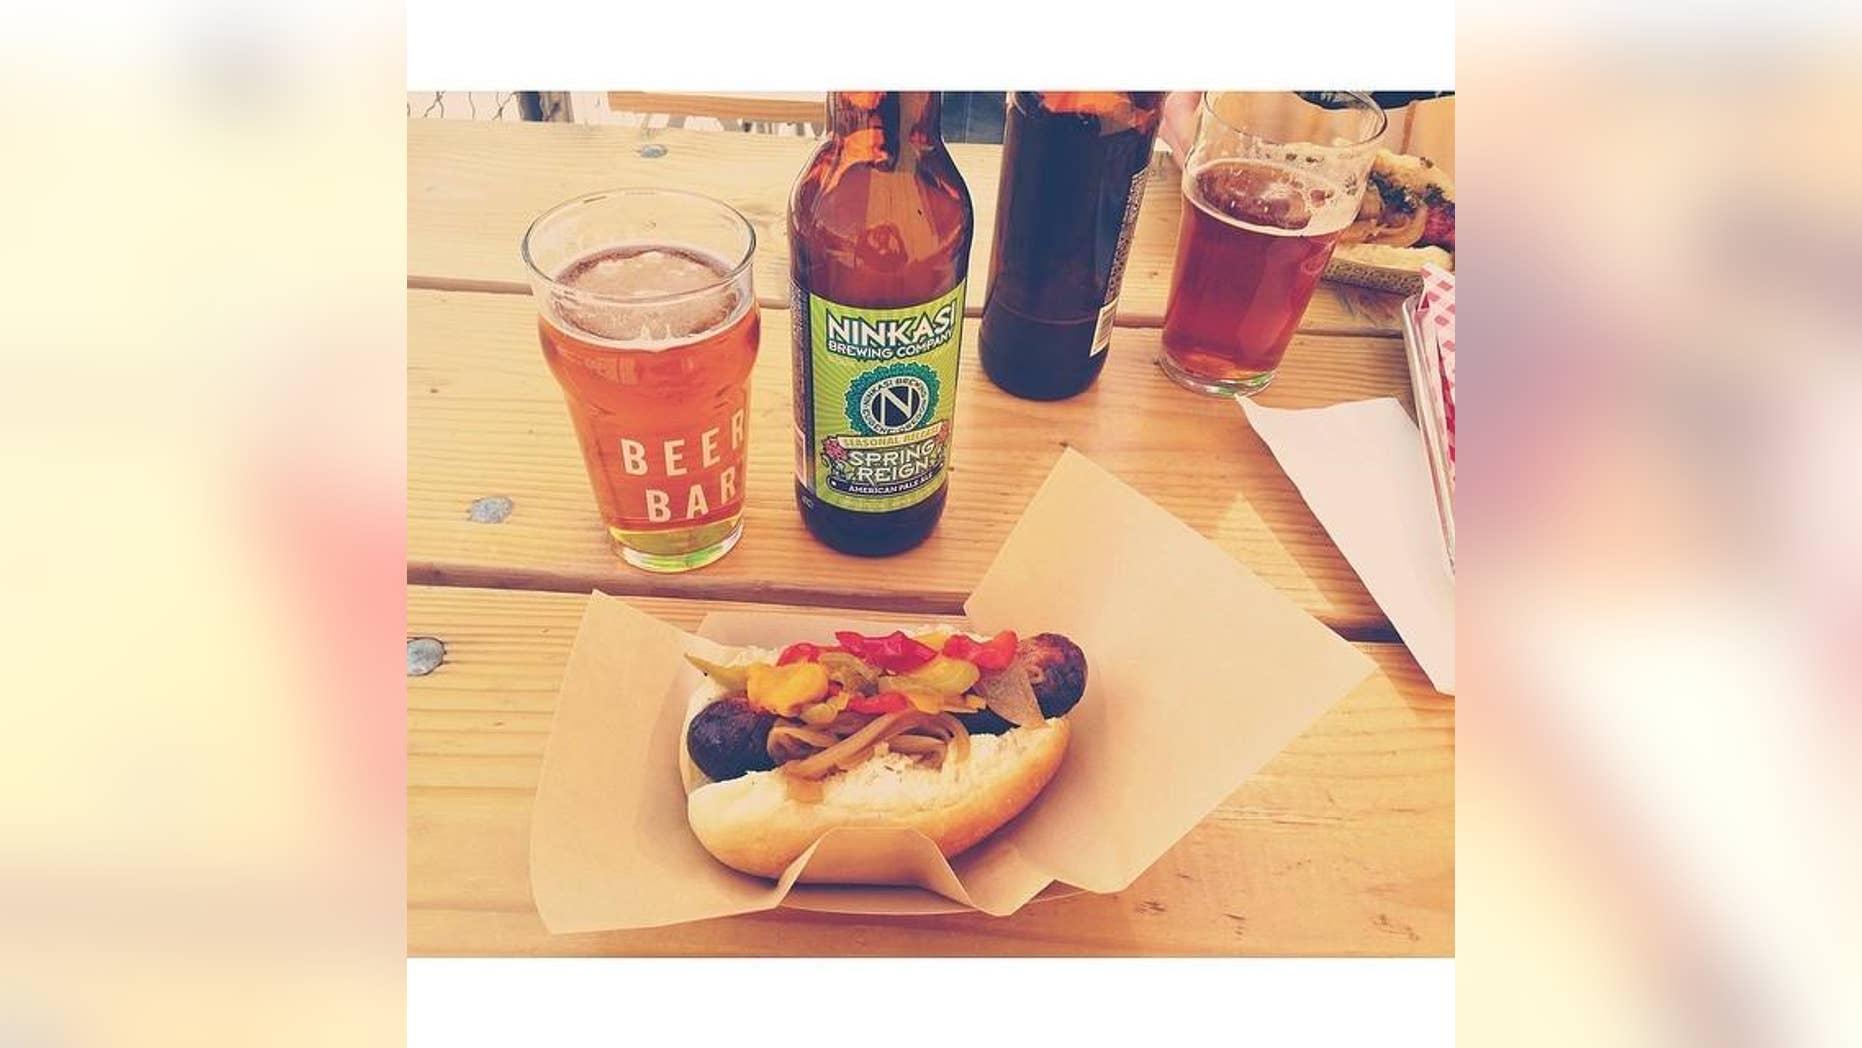 Travel & Leisure Magazine Names Best Hot Dog Destinations in America